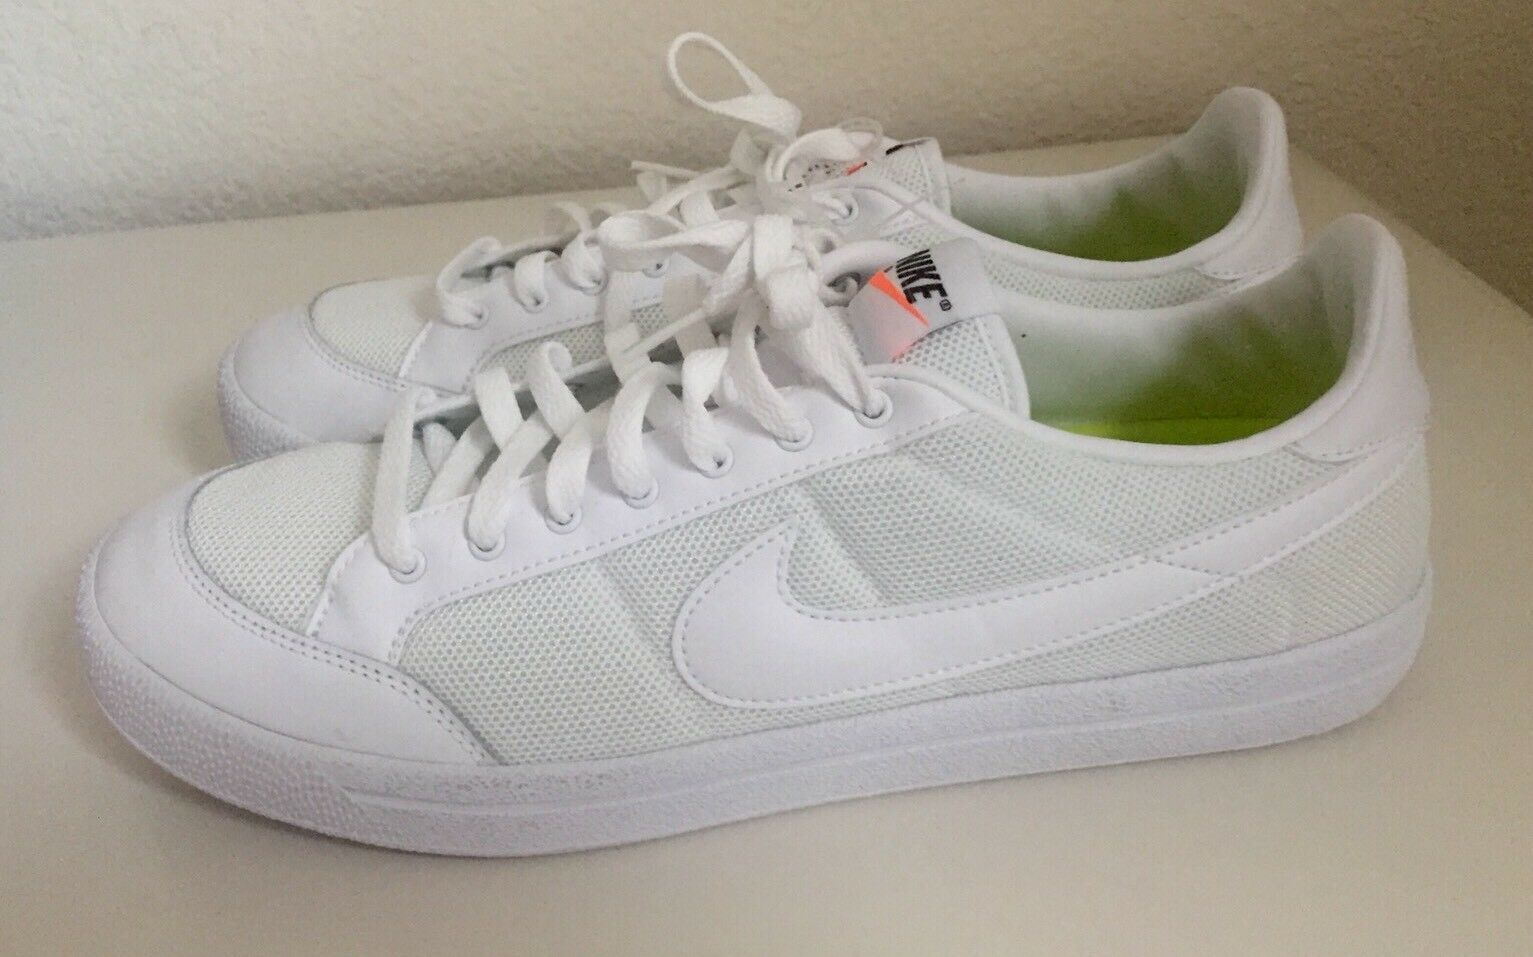 Nike Men's Sportswear Meadow 16 Textile Low Plimsole Canvas Shoes White Size 12